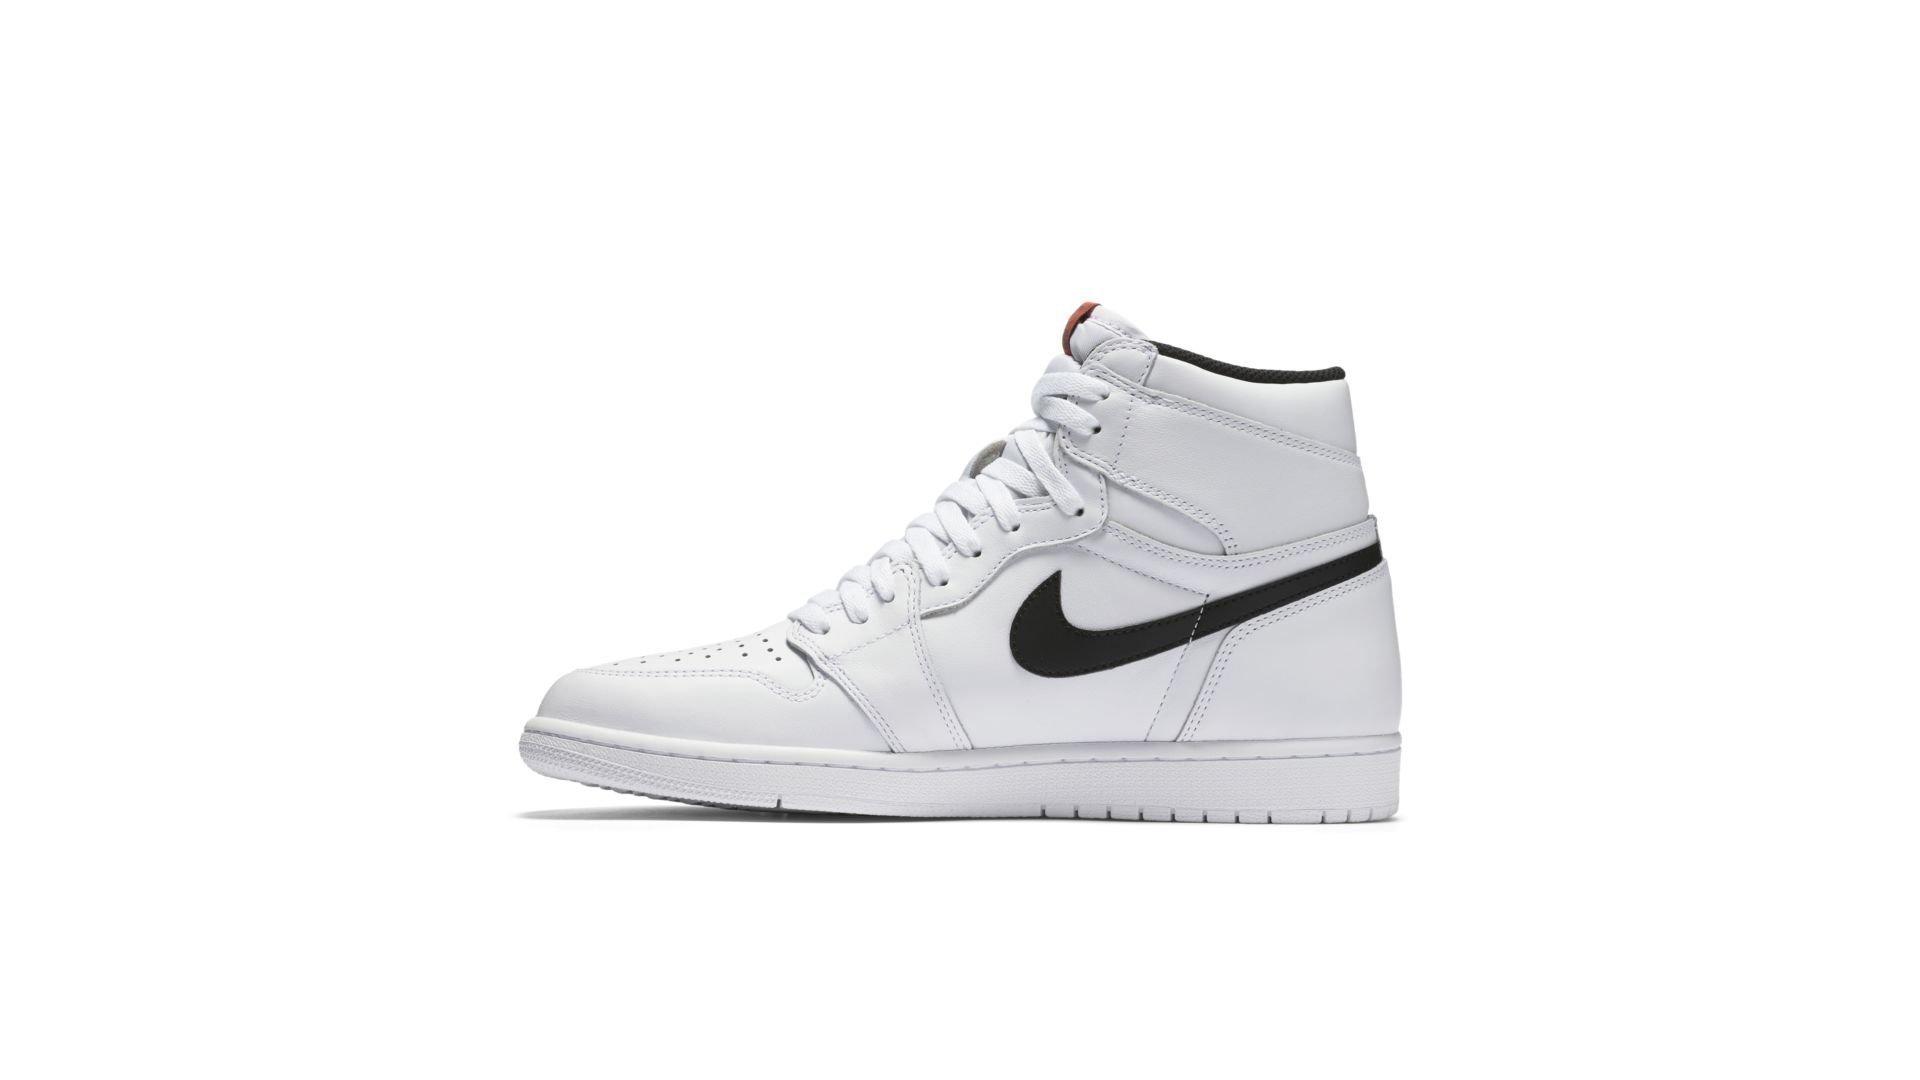 Jordan 1 Retro Yin Yang White (555088-102)